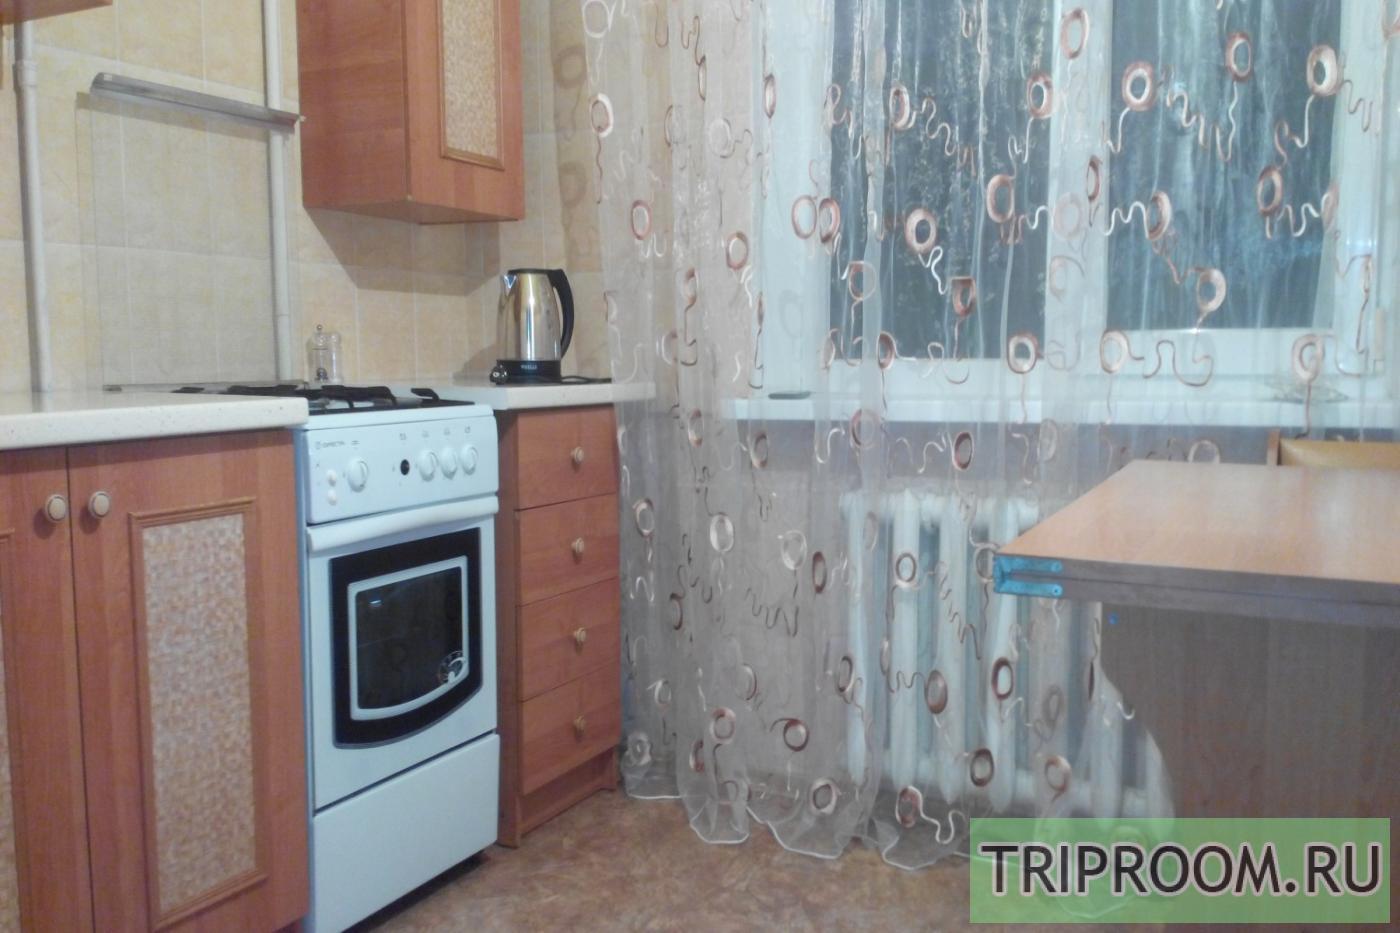 1-комнатная квартира посуточно (вариант № 30535), ул. Лермонтова улица, фото № 17